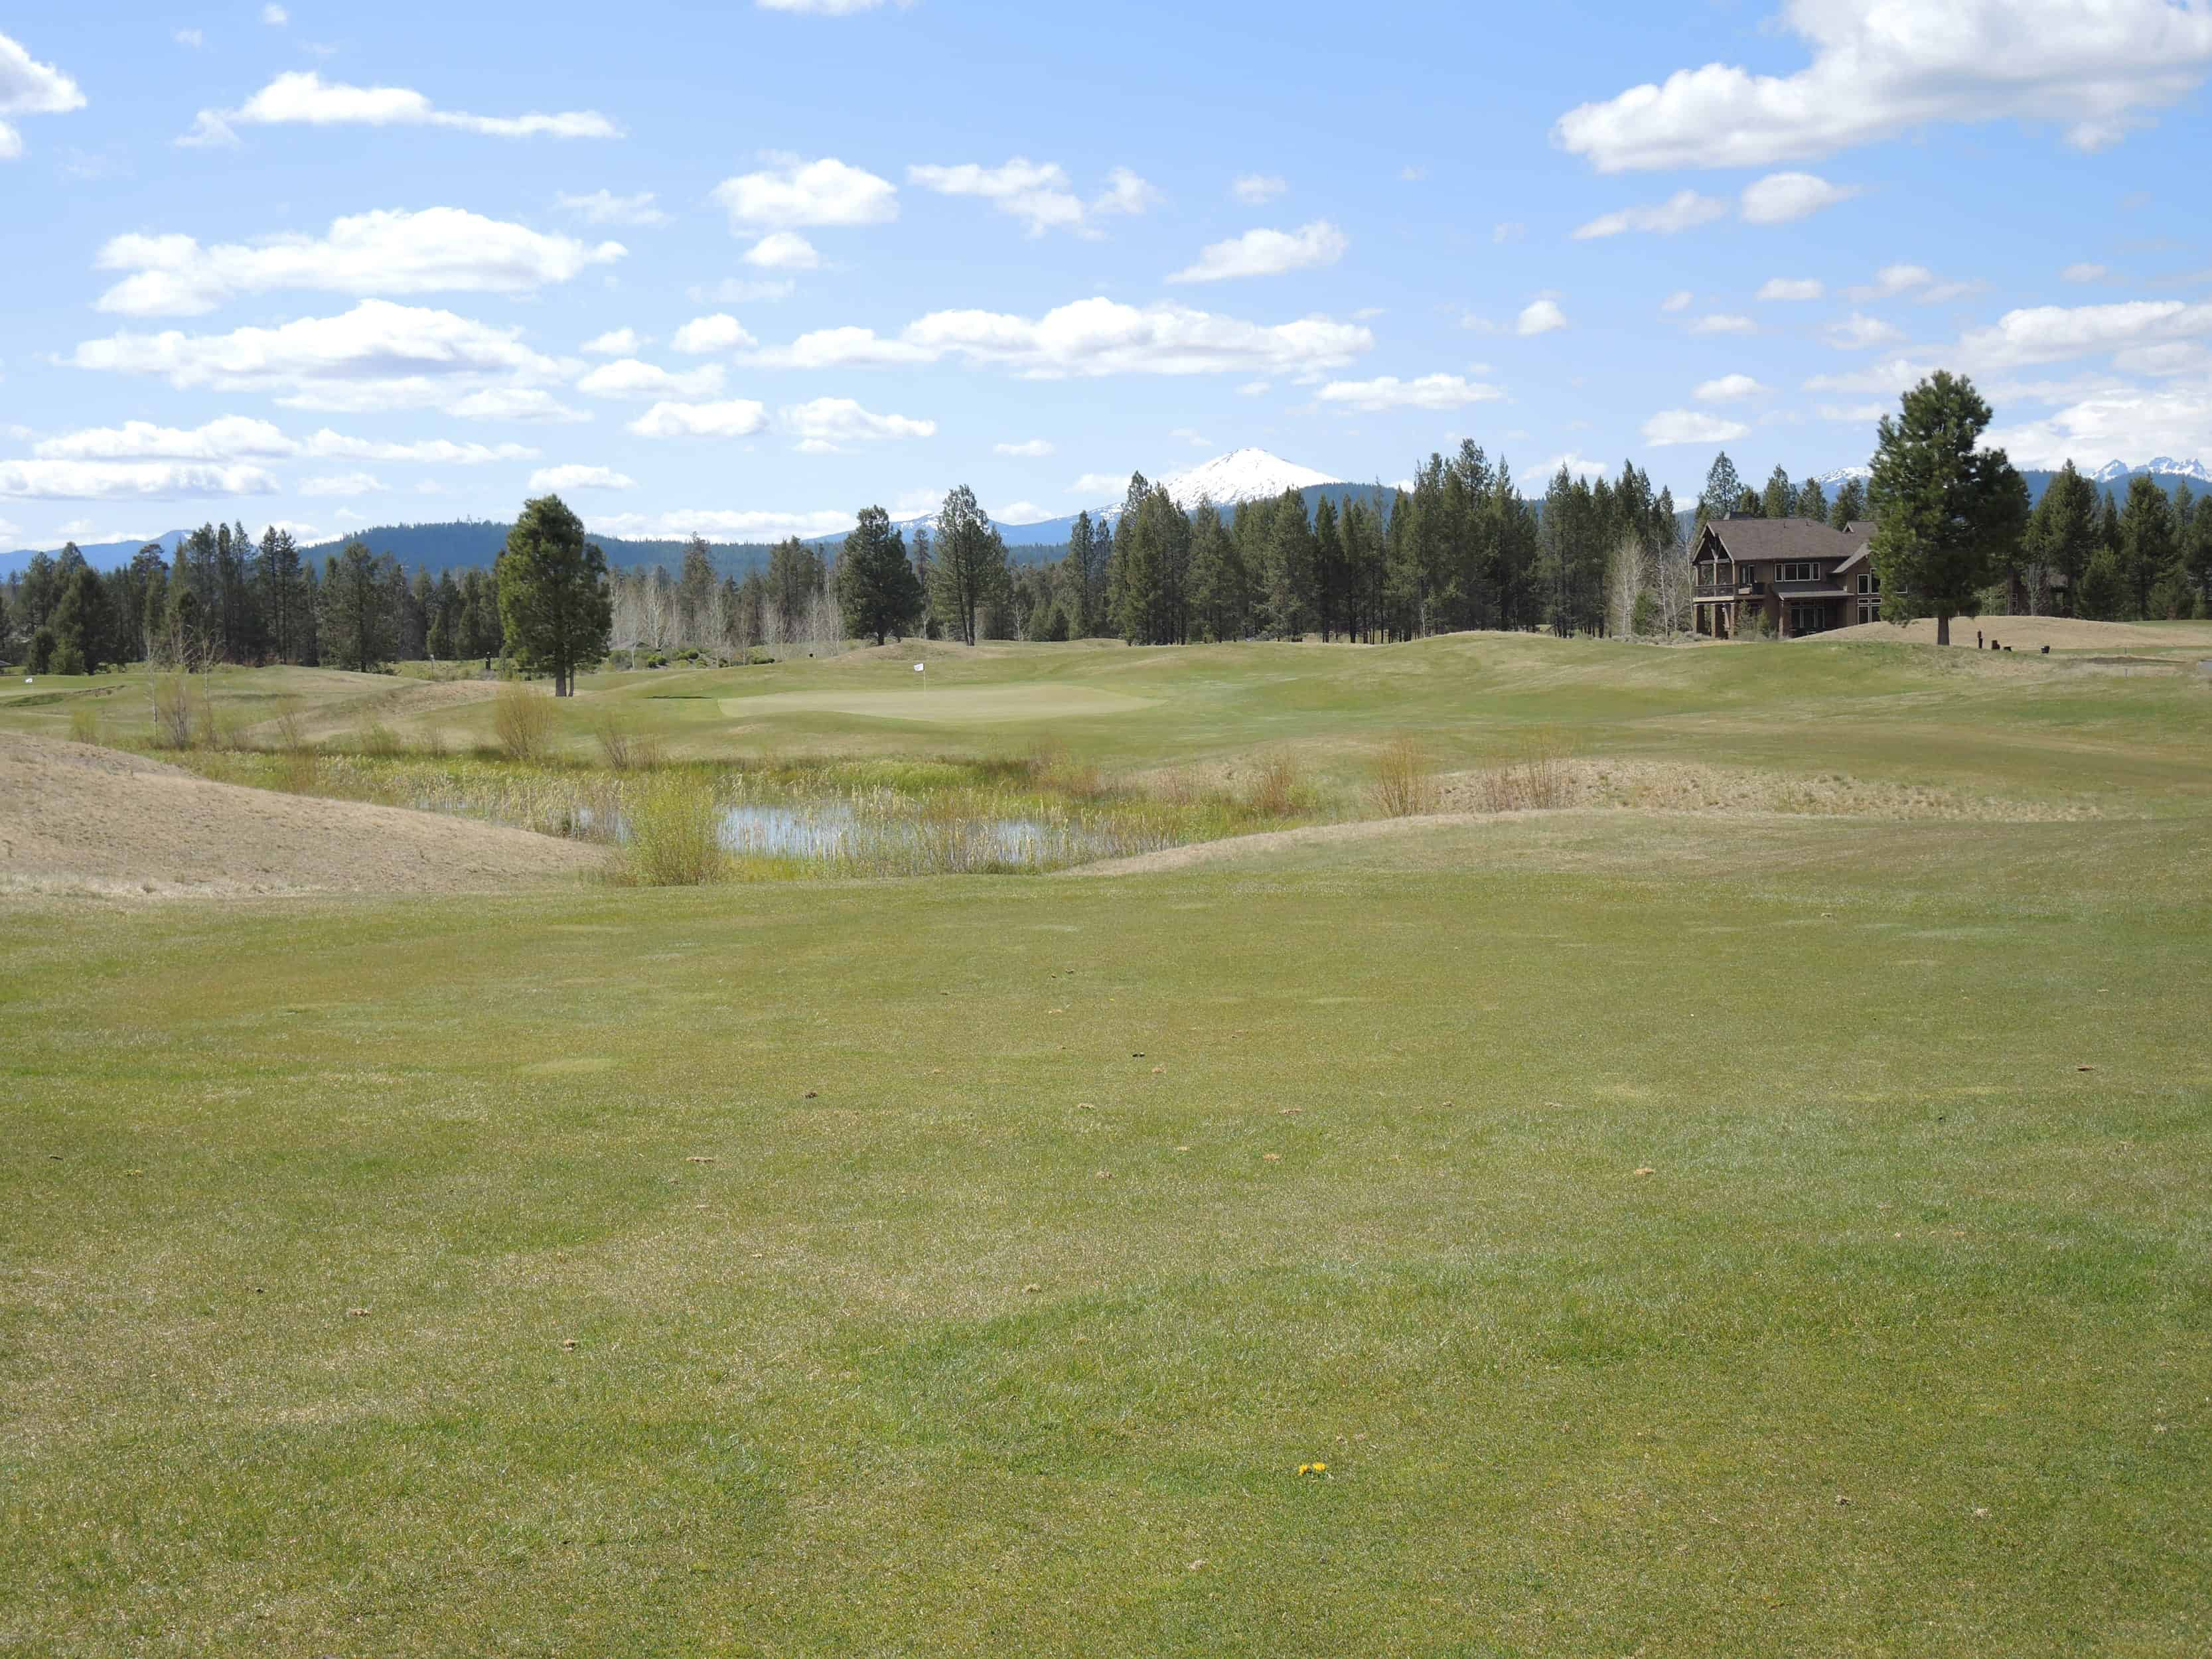 Caldera golf Sunriver